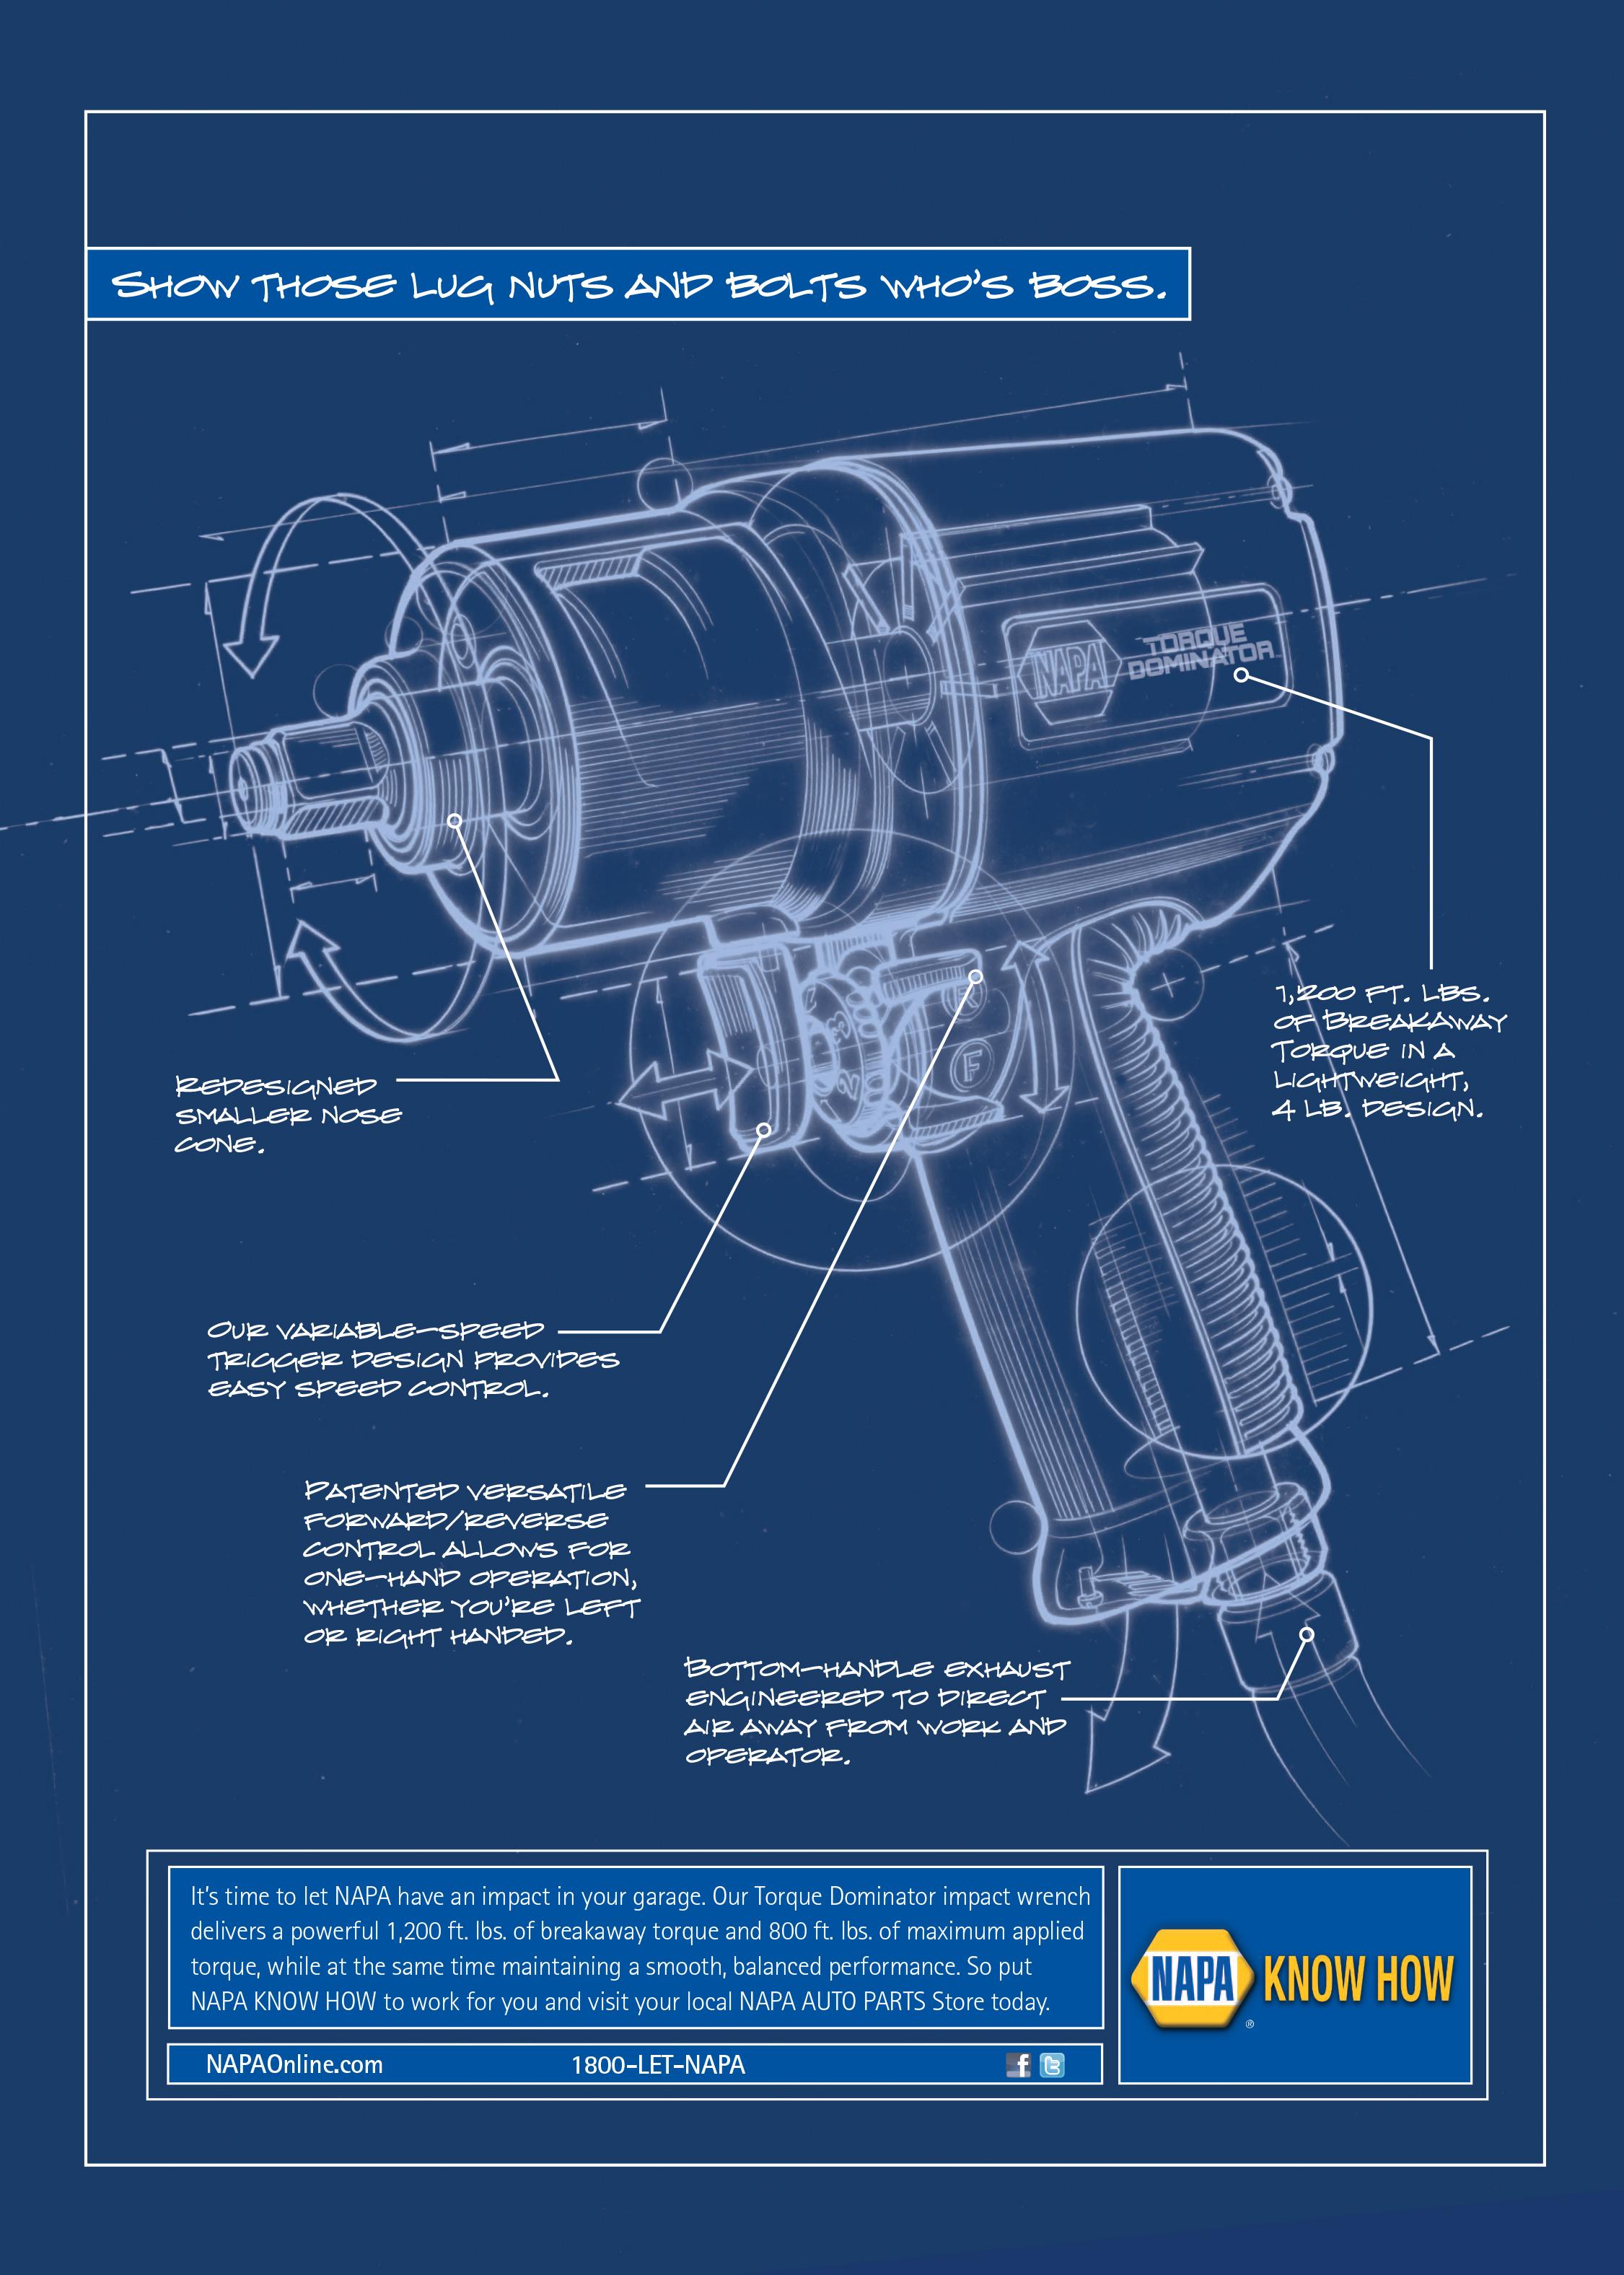 T1-8767-4 Tool-Torque Dominator Blueprint Ad_cropped.jpg